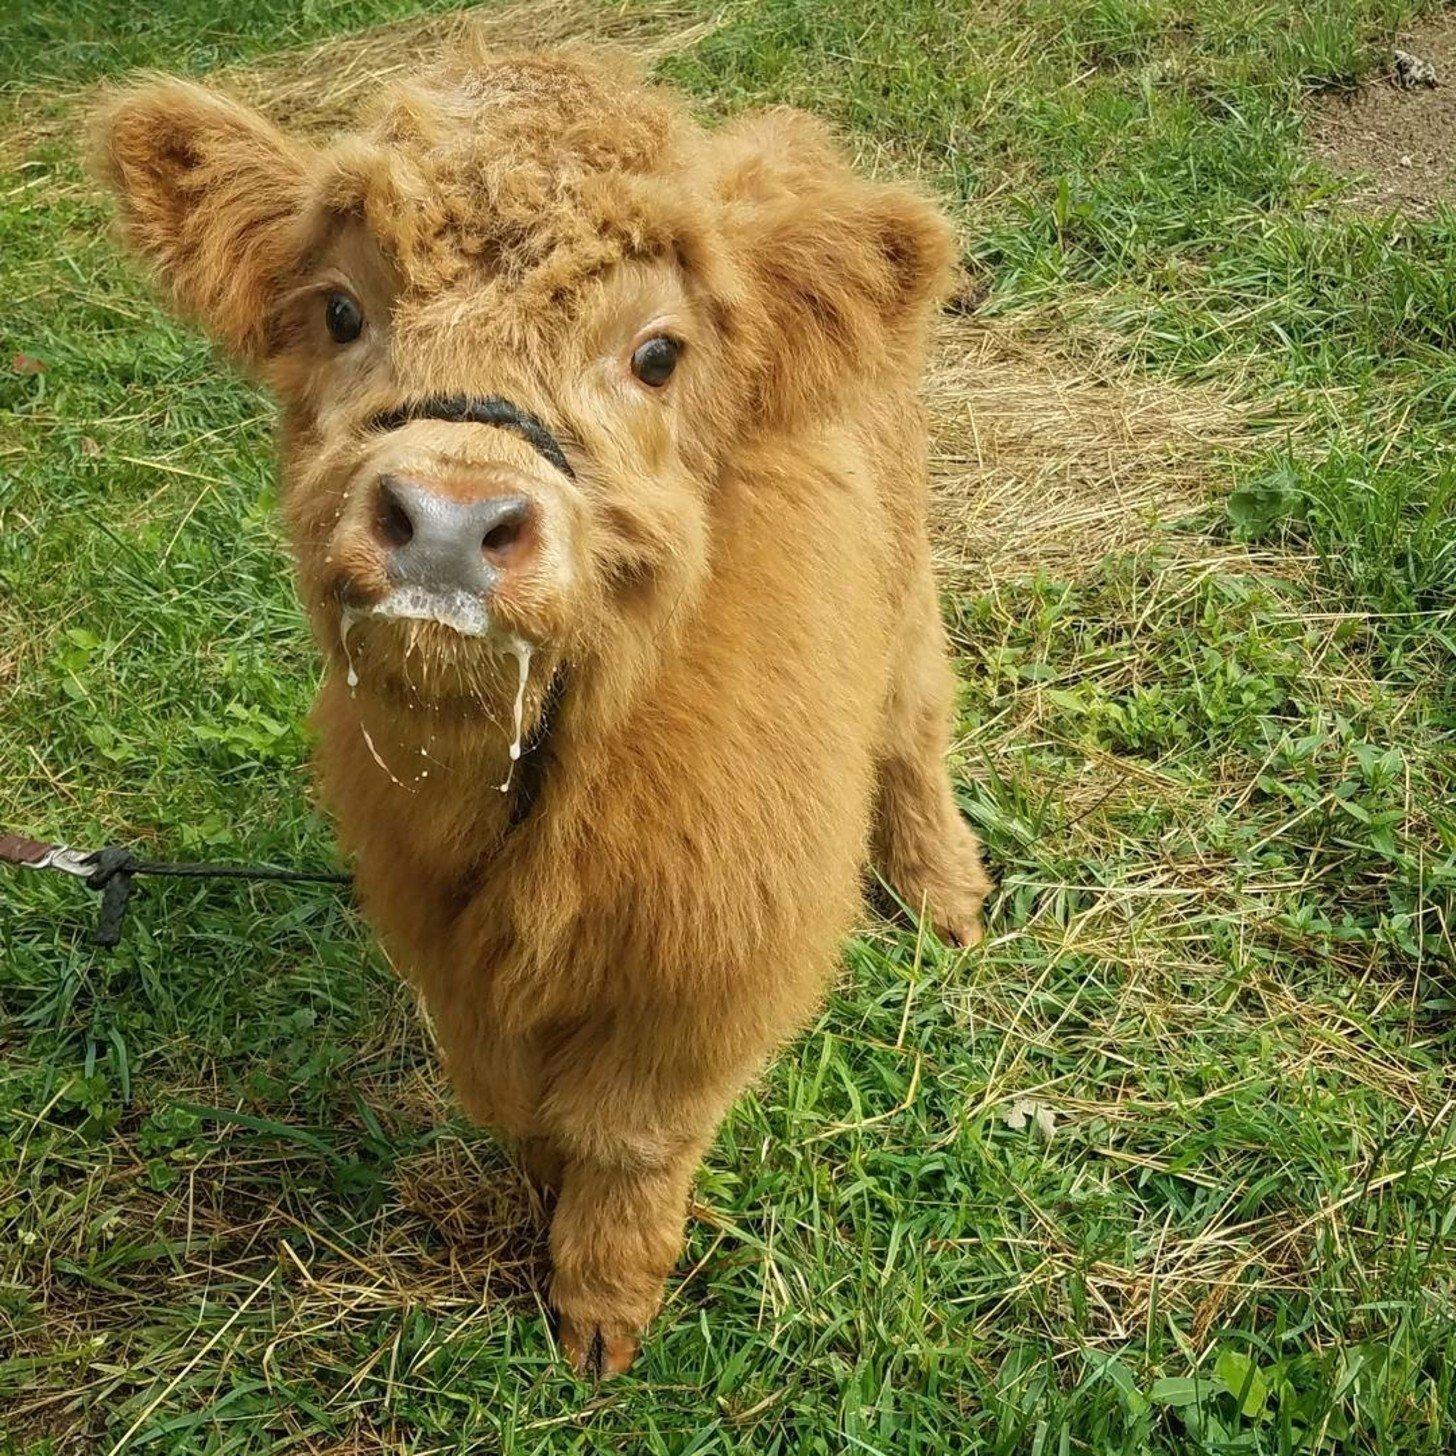 Highland cow photo